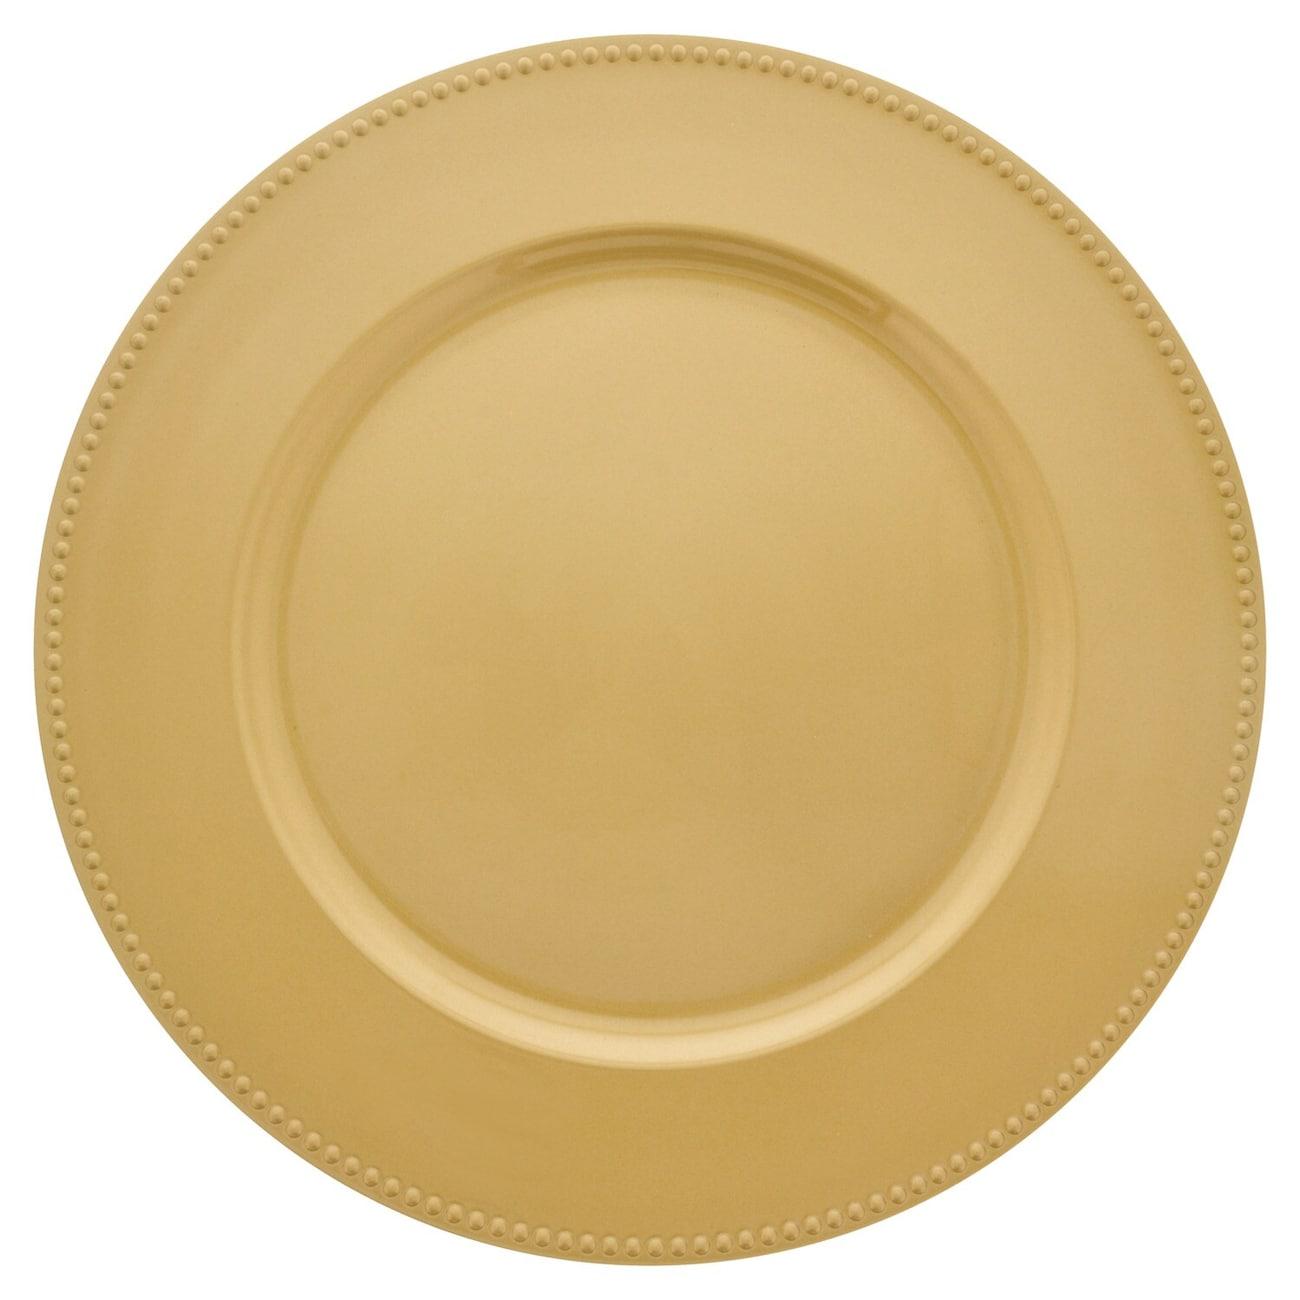 Decorative Plates - Dollar Tree, Inc.